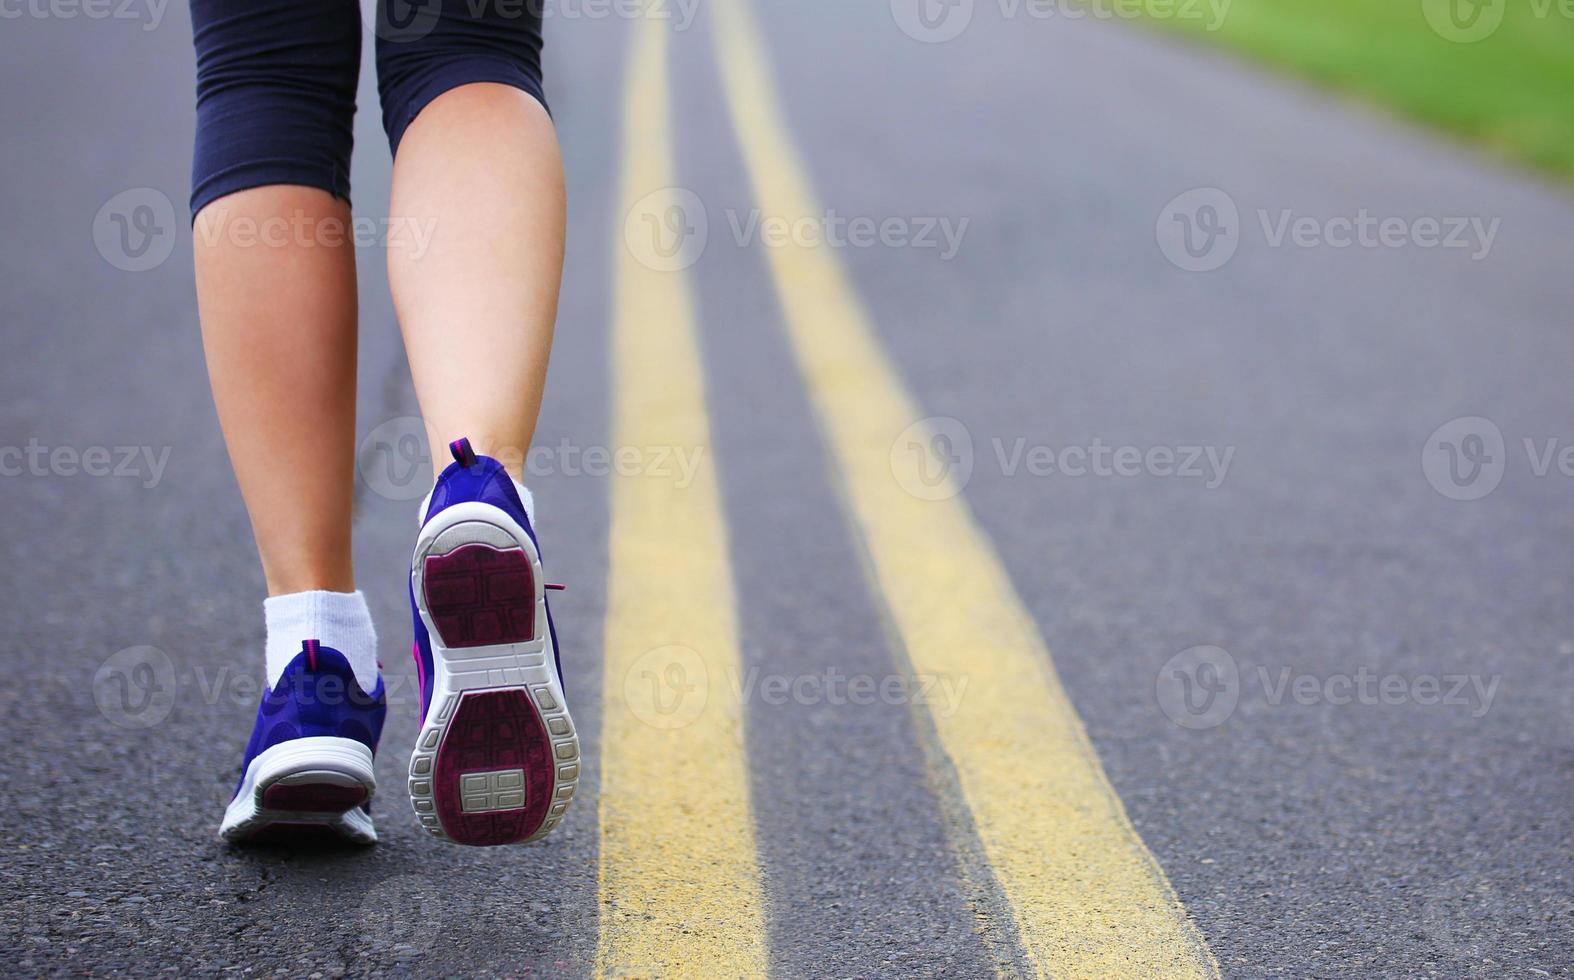 pés femininos de corredor correndo na estrada foto